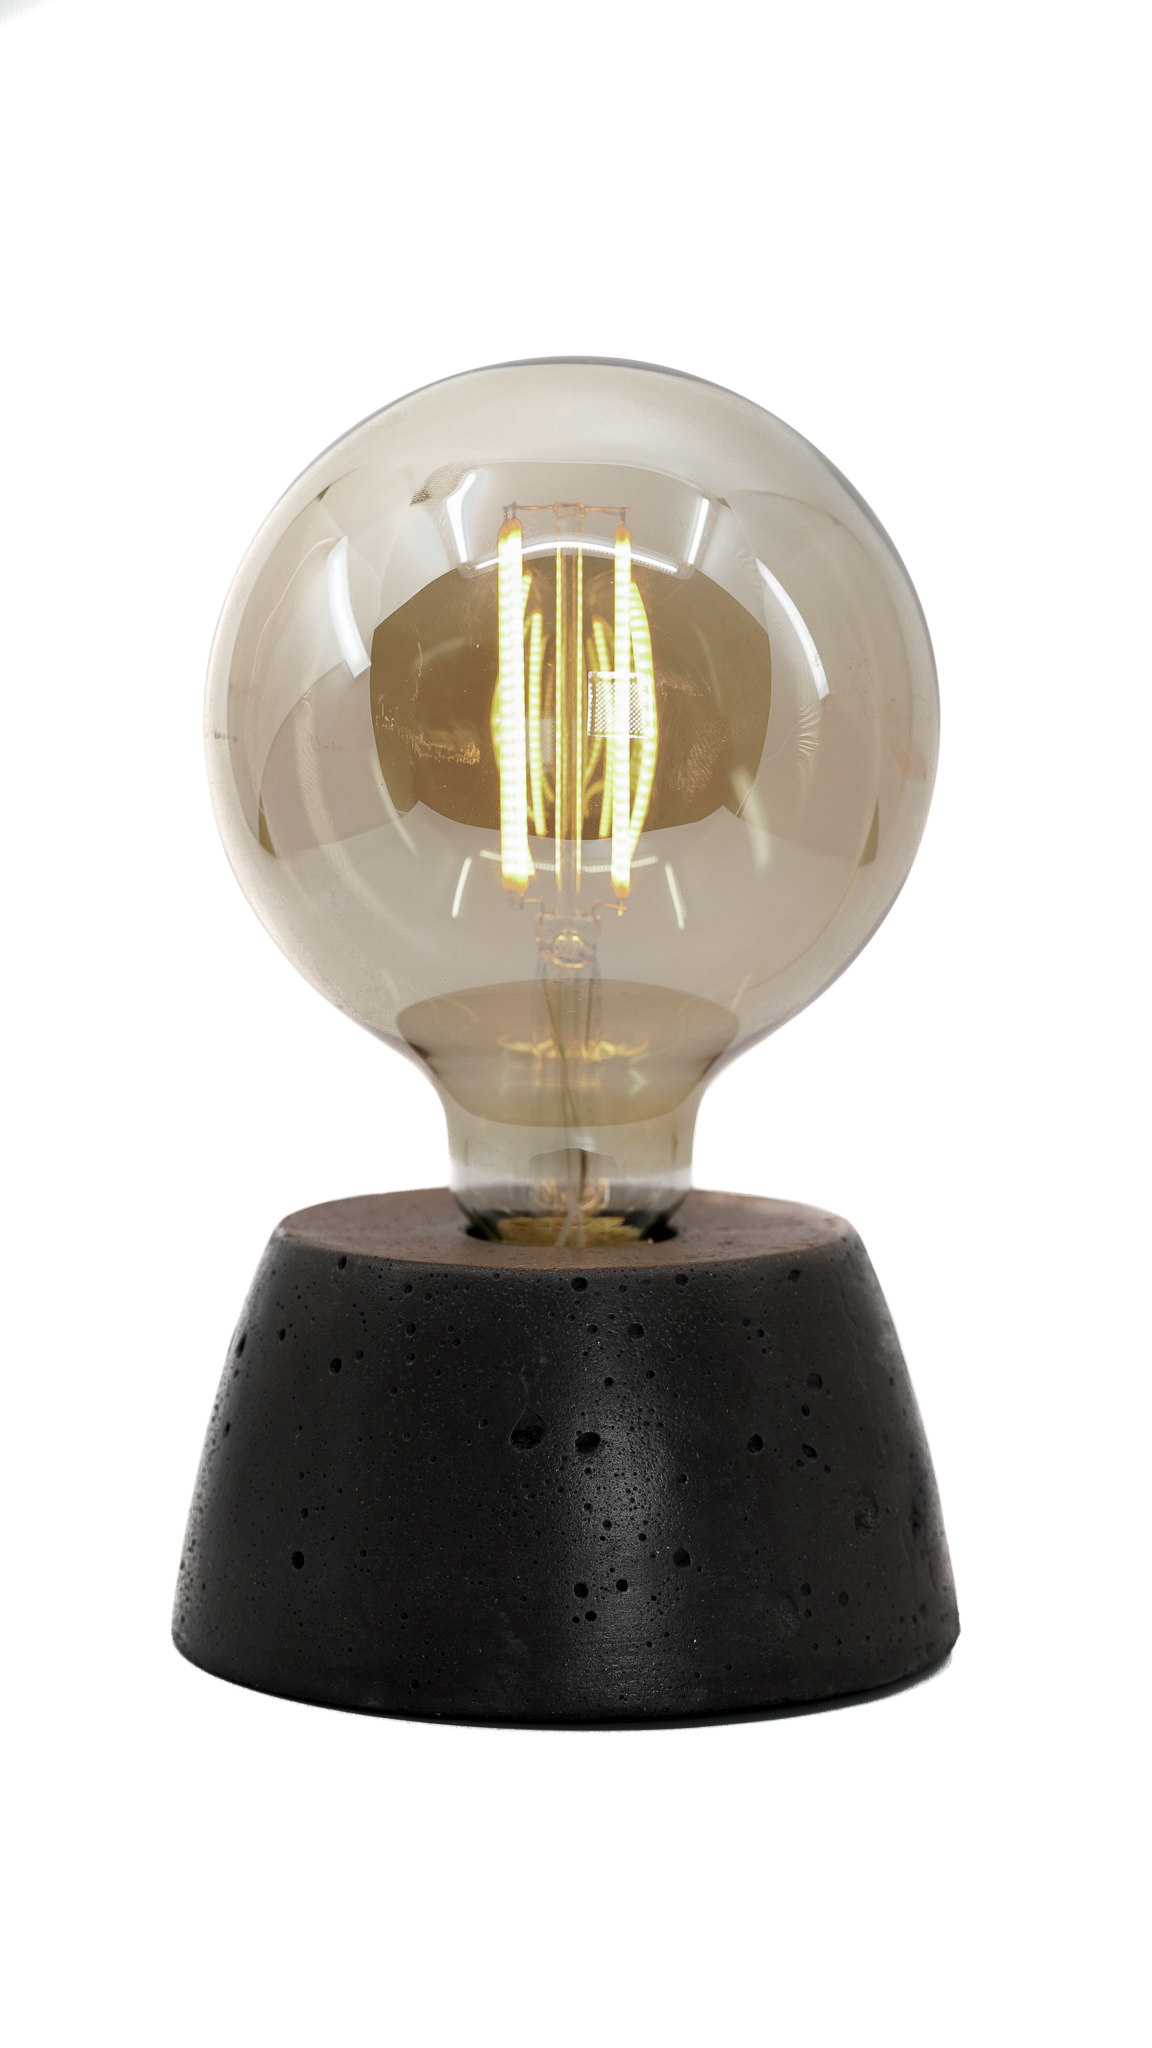 Lampe dôme en béton anthracite fabrication artisanale